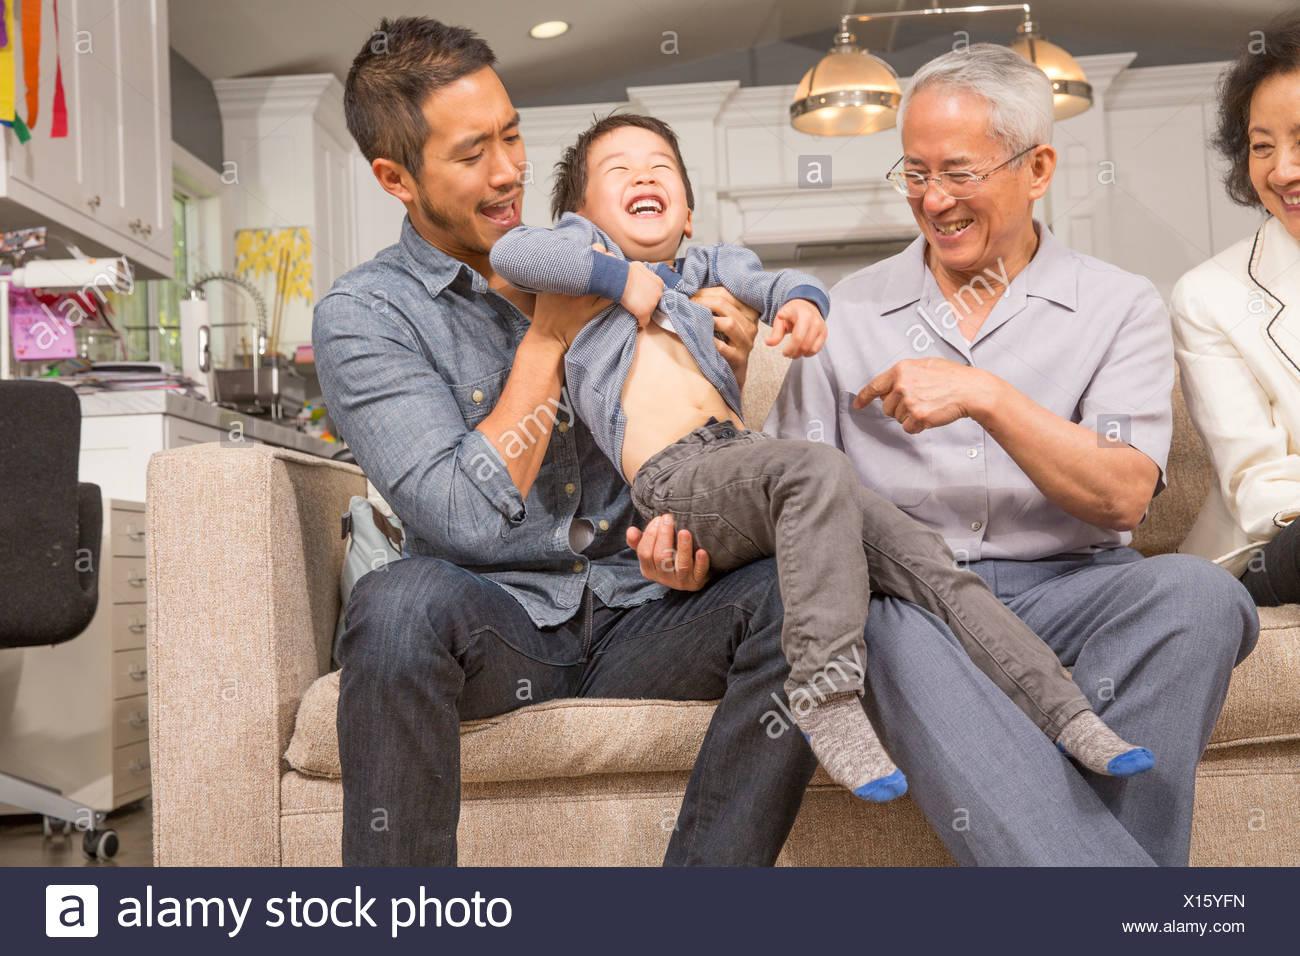 tickling stockfotos tickling bilder seite 2 alamy. Black Bedroom Furniture Sets. Home Design Ideas